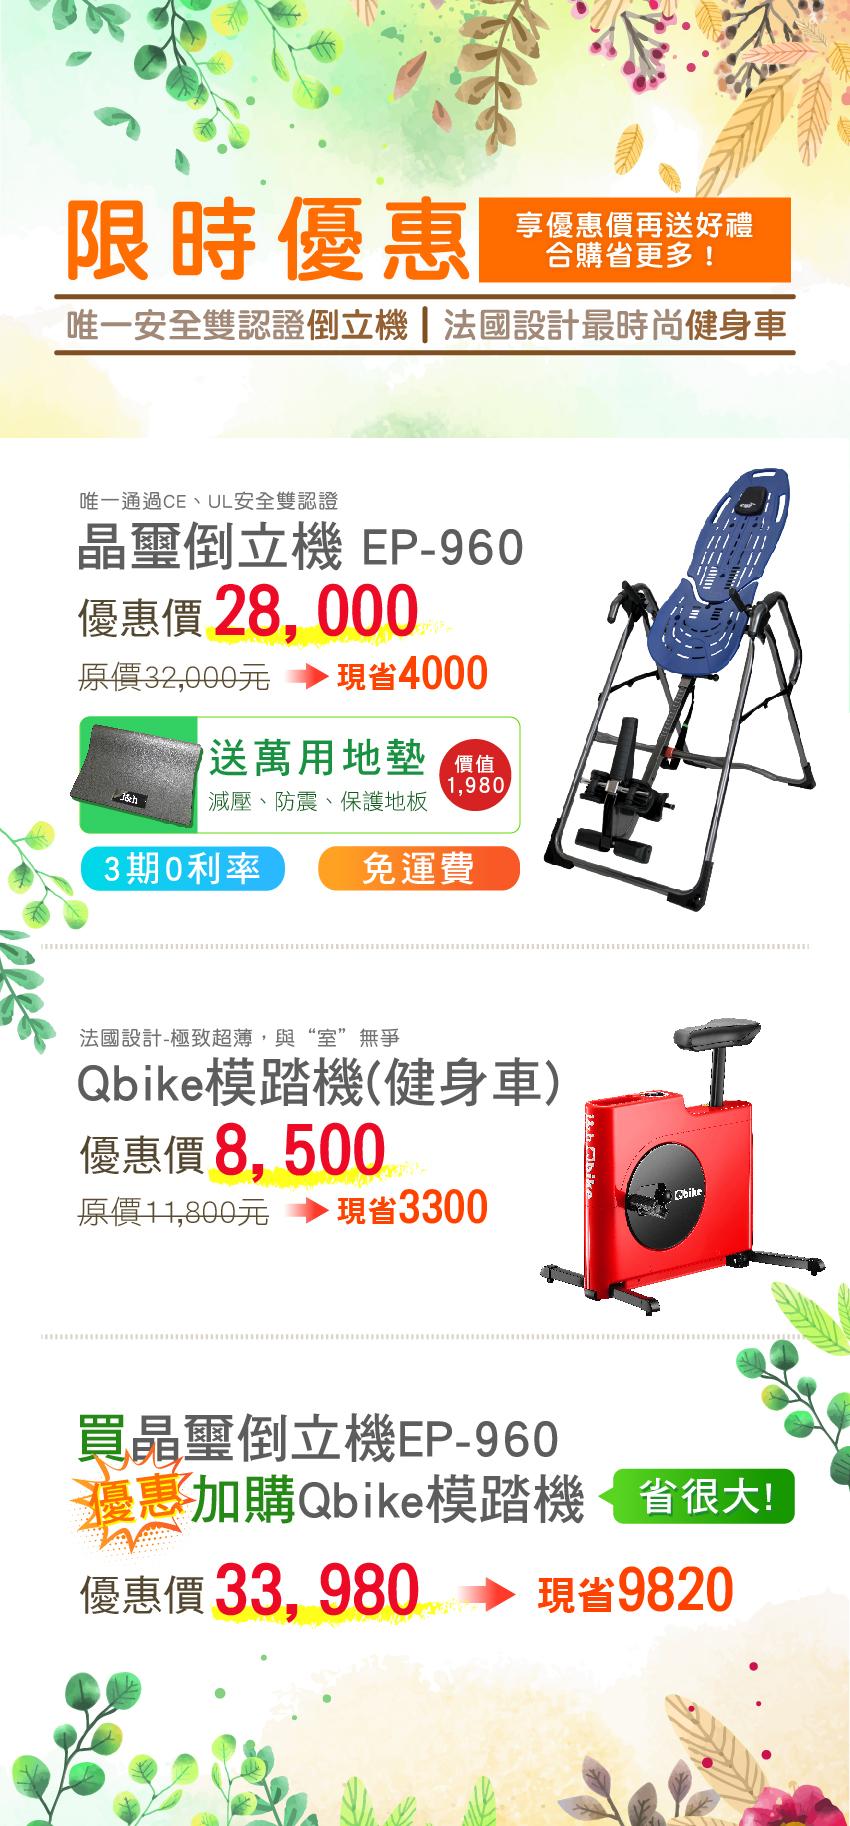 晶璽TEETER倒立機EP-960特價28,000 Qbike特價8,500 買EP-960-5折加購Qbike模踏機 現省9,820